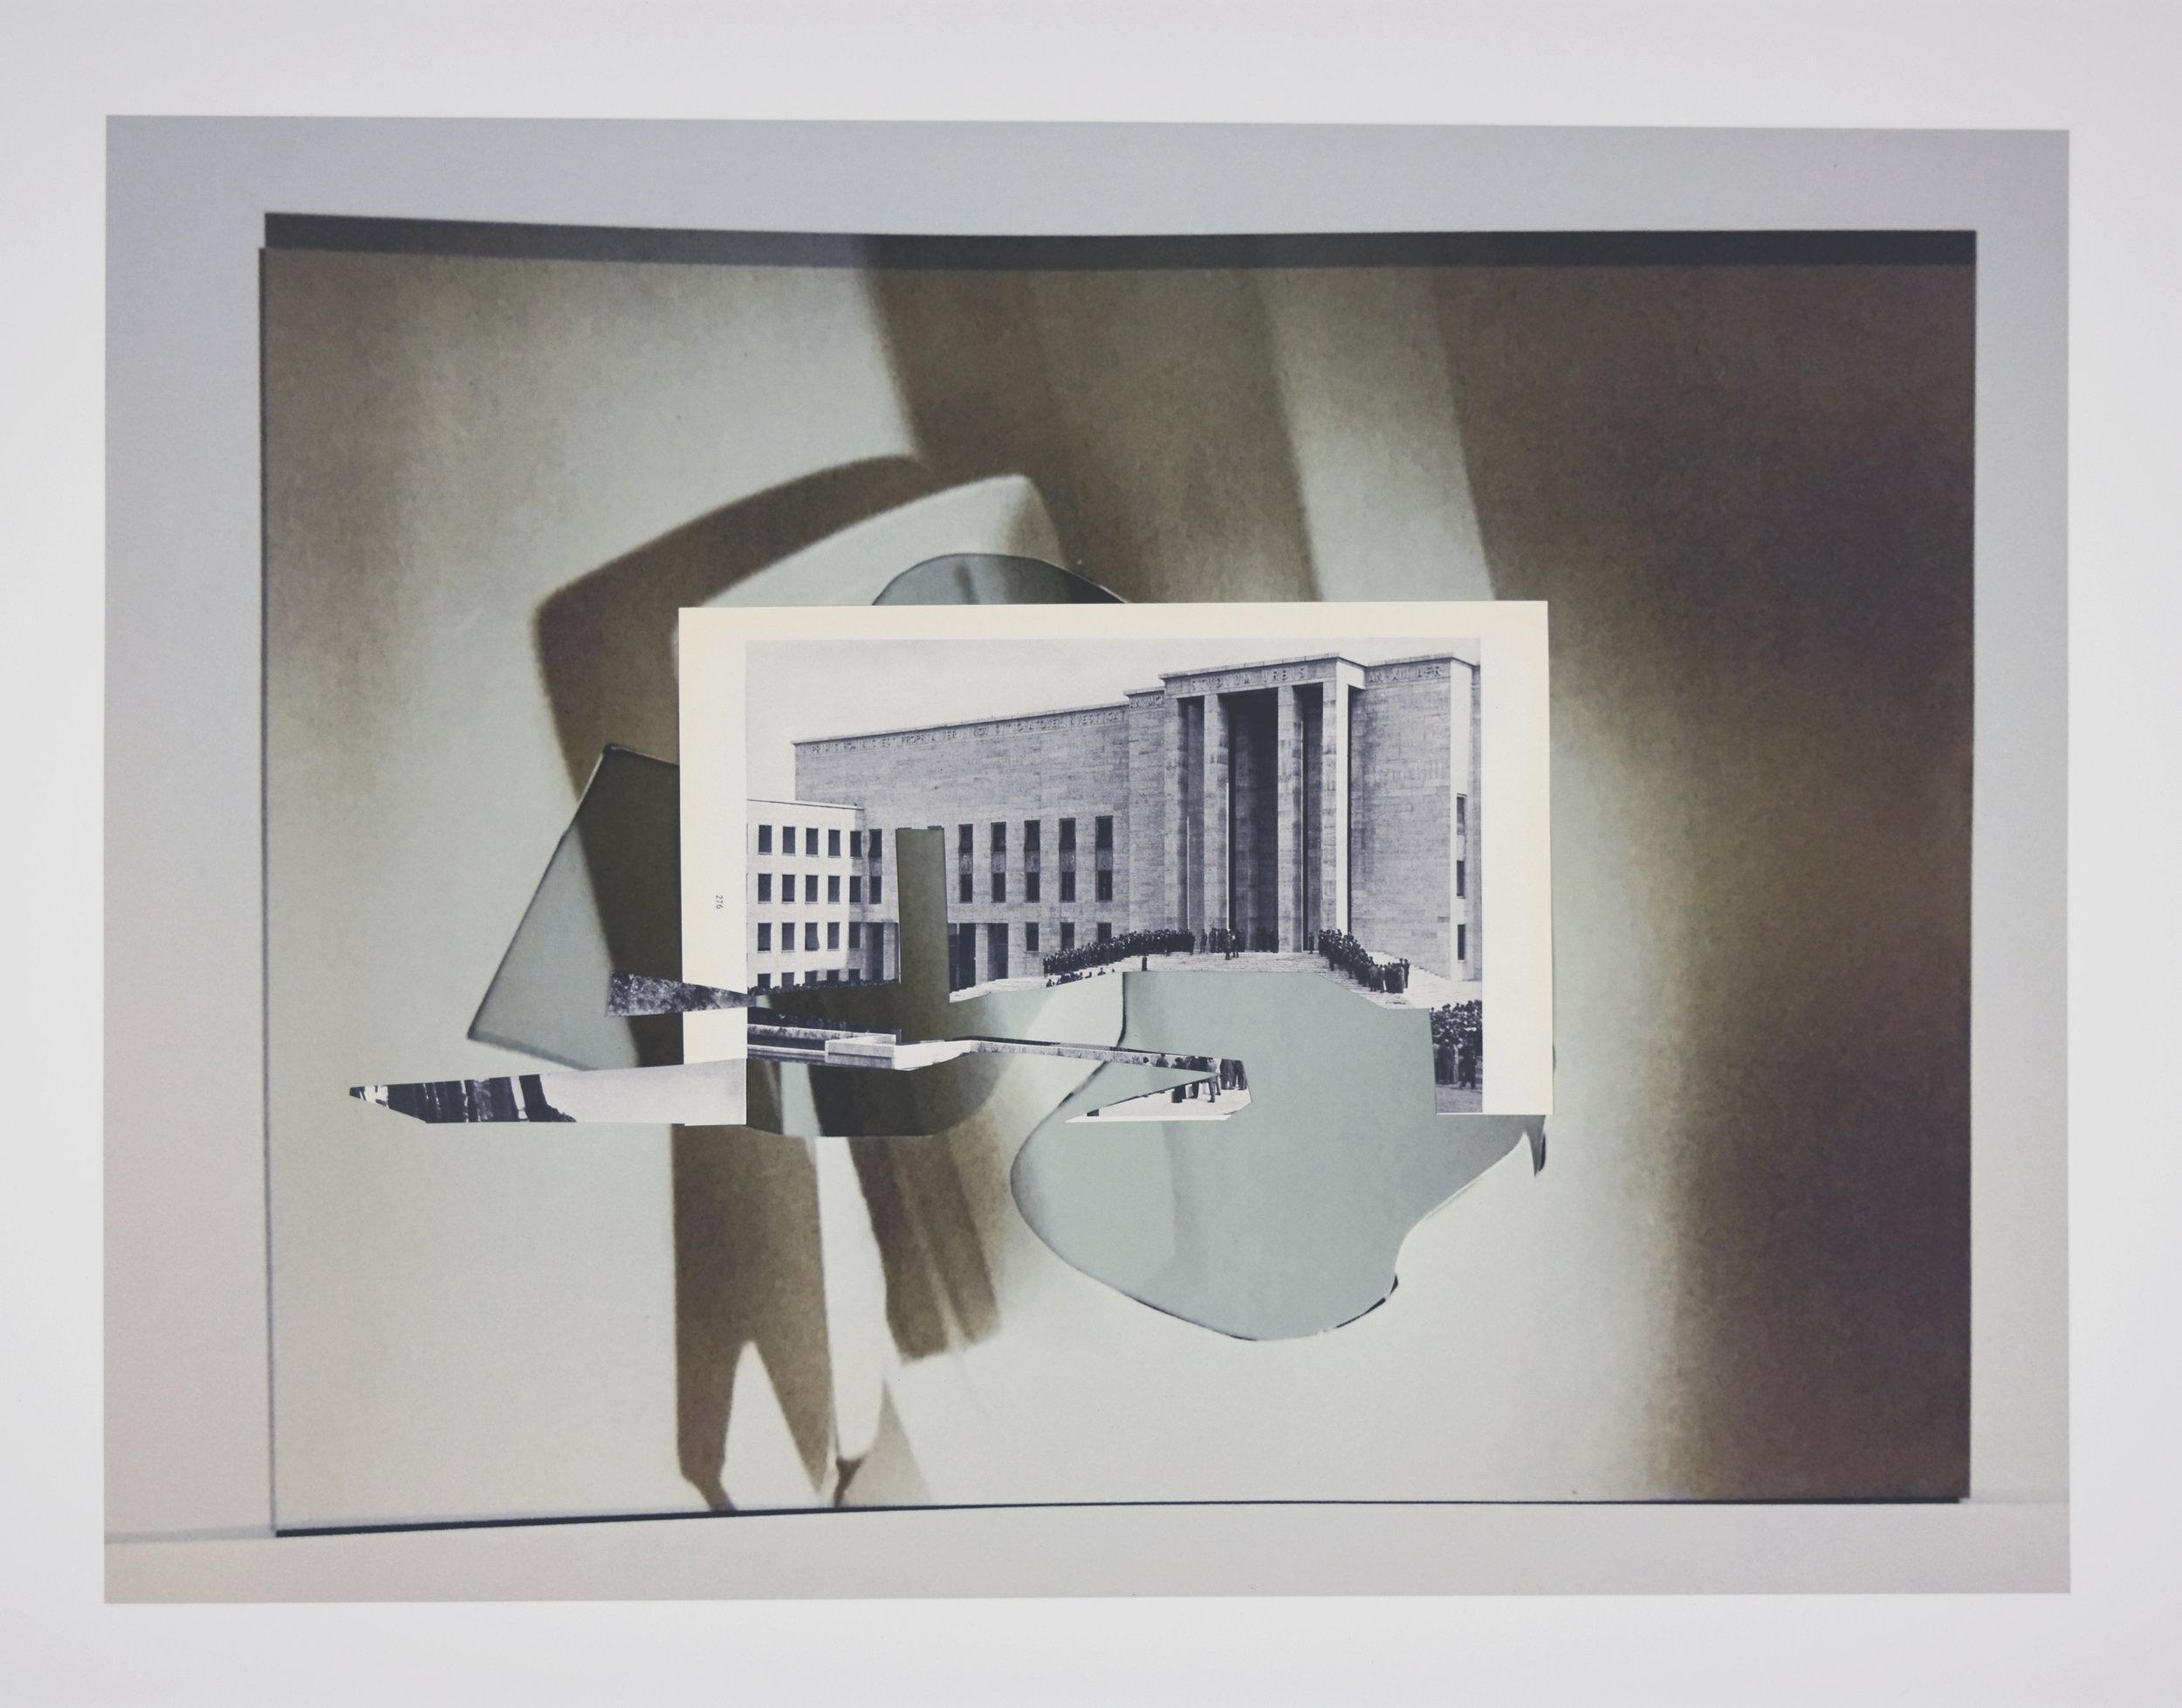 """Volatile wonder"", epson print, found image, 16,5""x 24"", 2016"